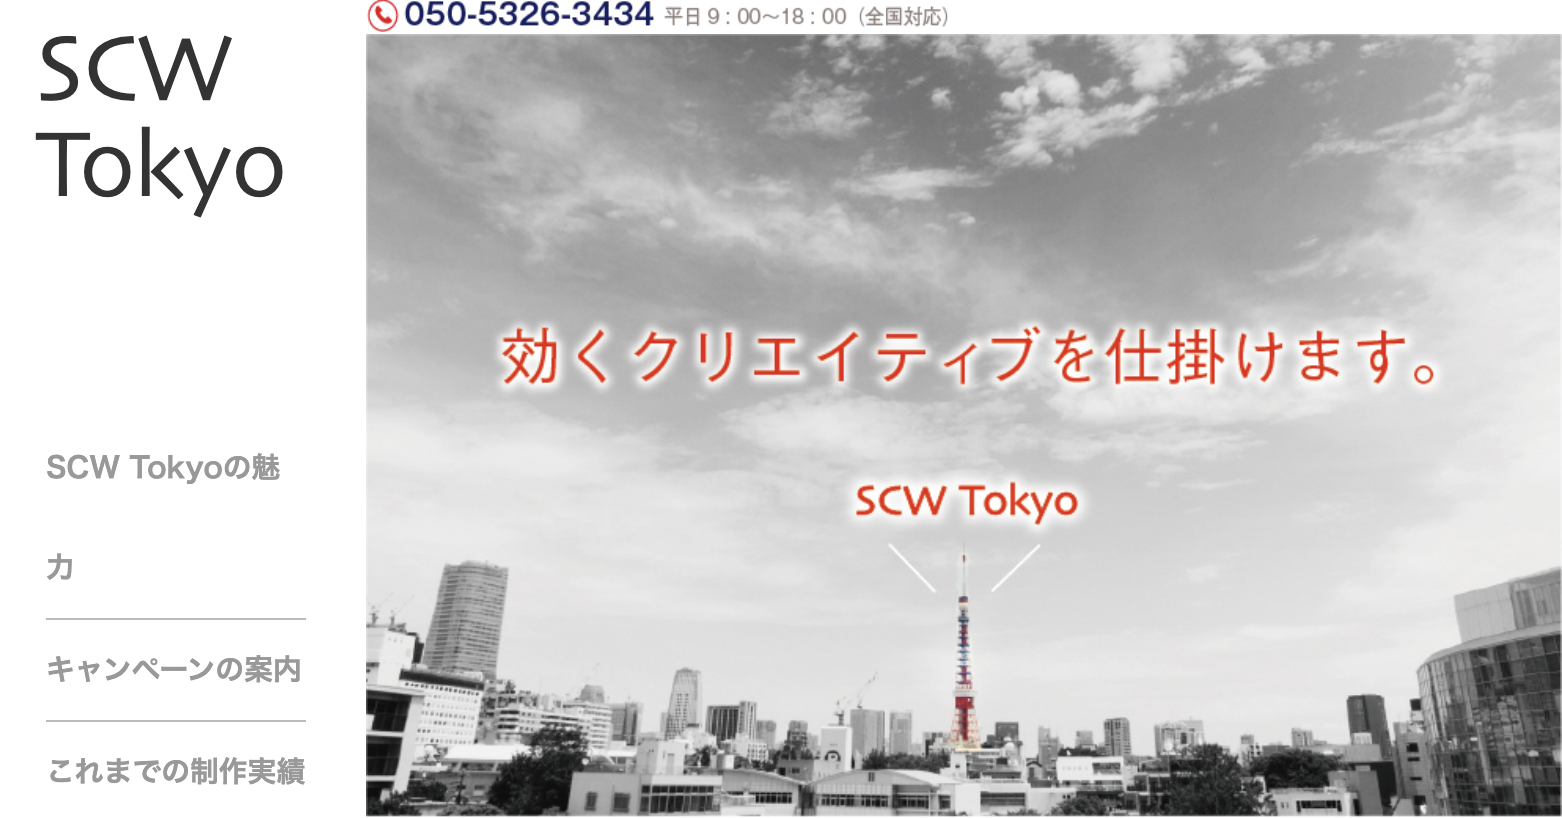 SCW Tokyo合同会社